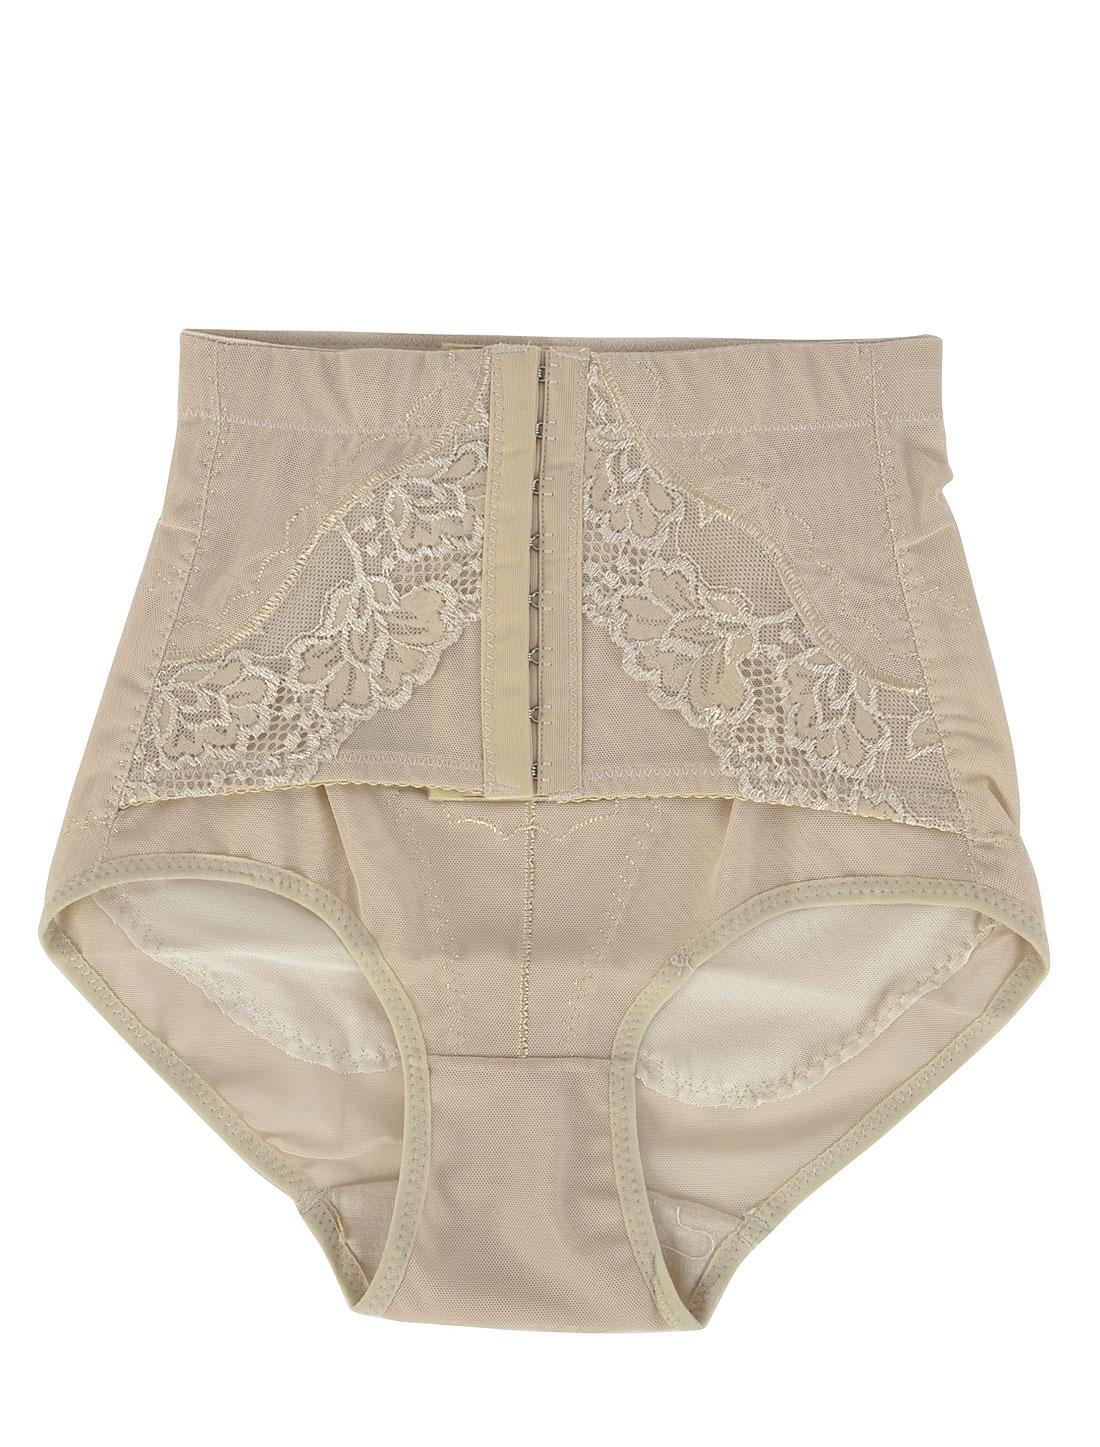 Elastic High Waist Control Corset Shaper Underwear Briefs Beige XS for Women